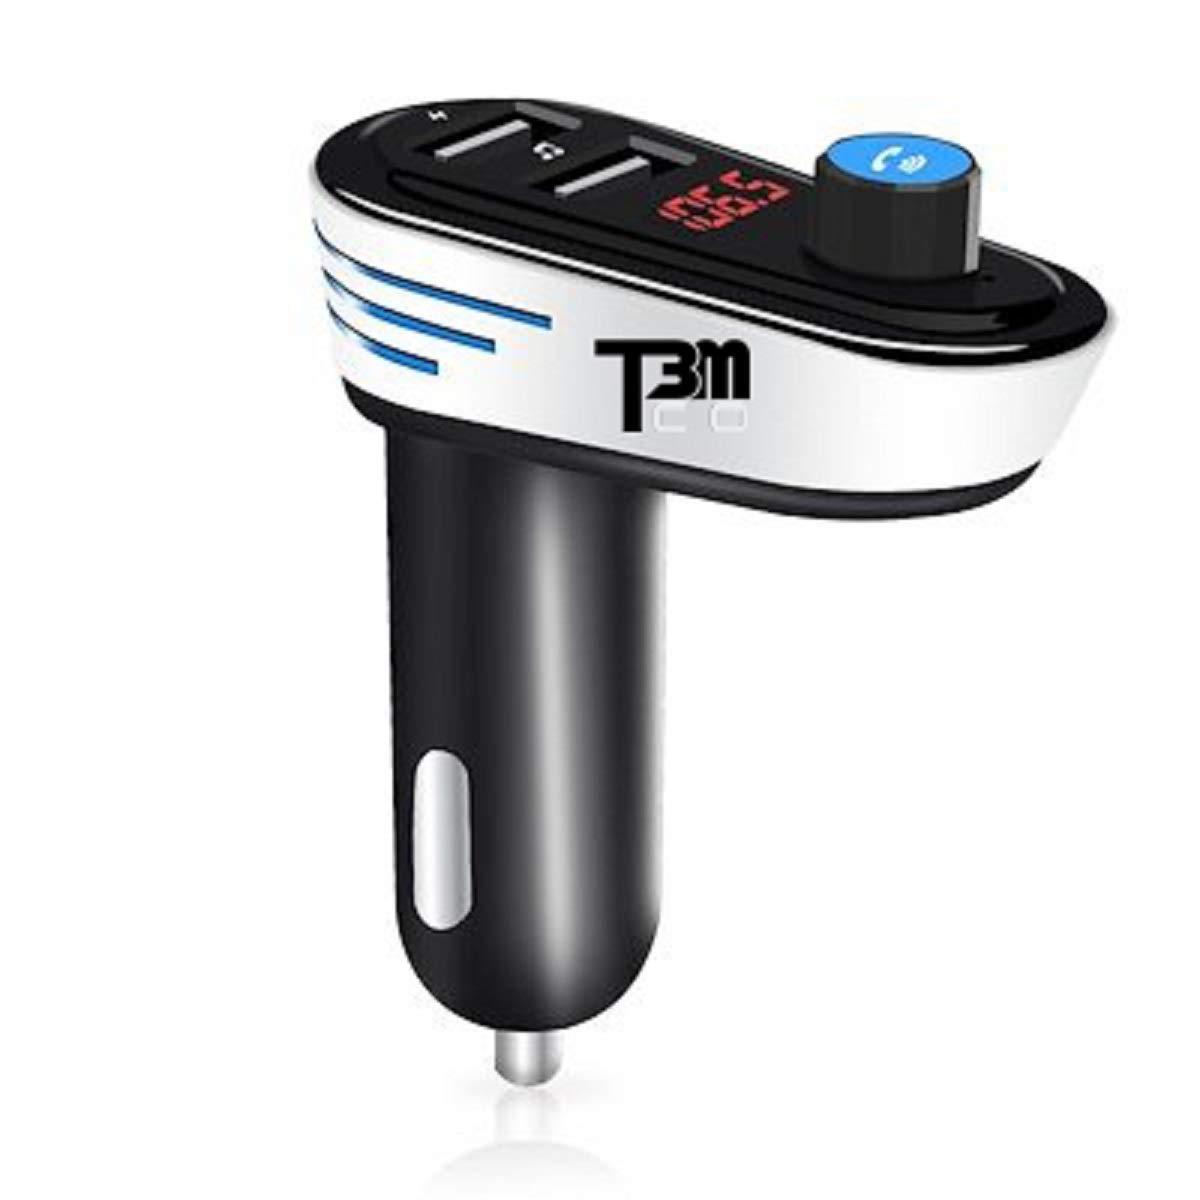 [2018] T3MCO Ultimate Coche Bluetooth FM transmisor 2 x Puerto USB de Carga rá pida, Reproductor de MP3 para Coche